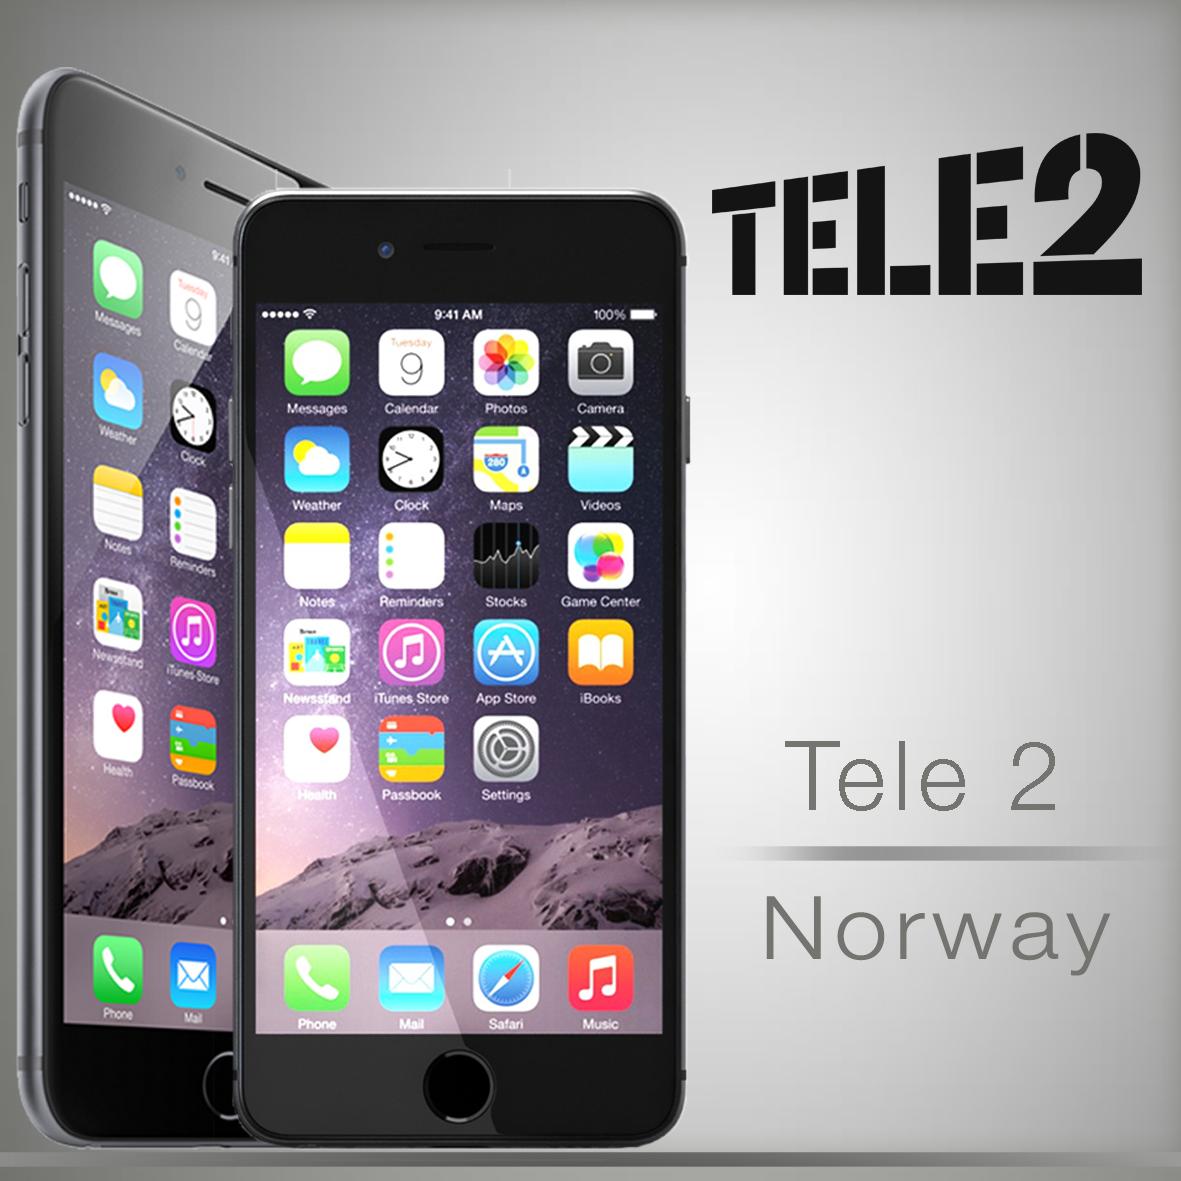 Unlock Tele2 Norway iPhone 6 Plus 6 5s 5c 5 4s 4 Unlock